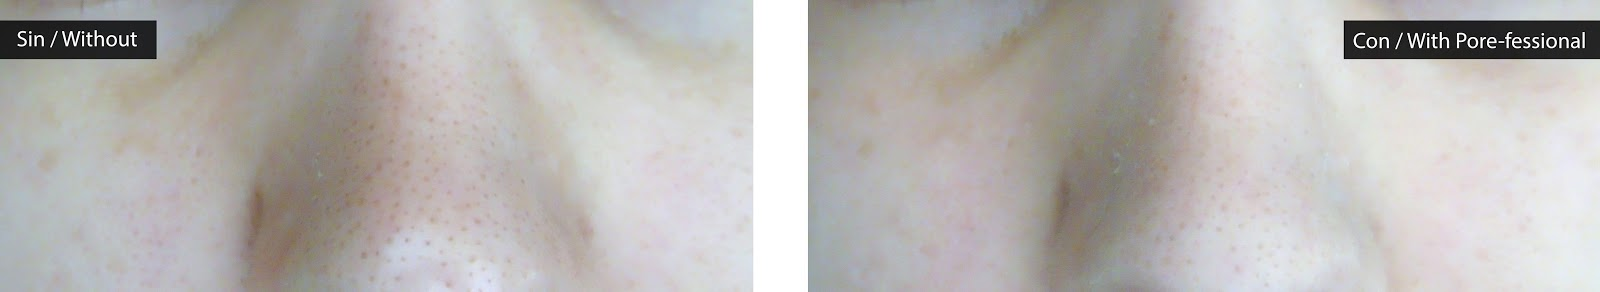 Review porefessional before and after on big pores, reseña antes y después poros grandes